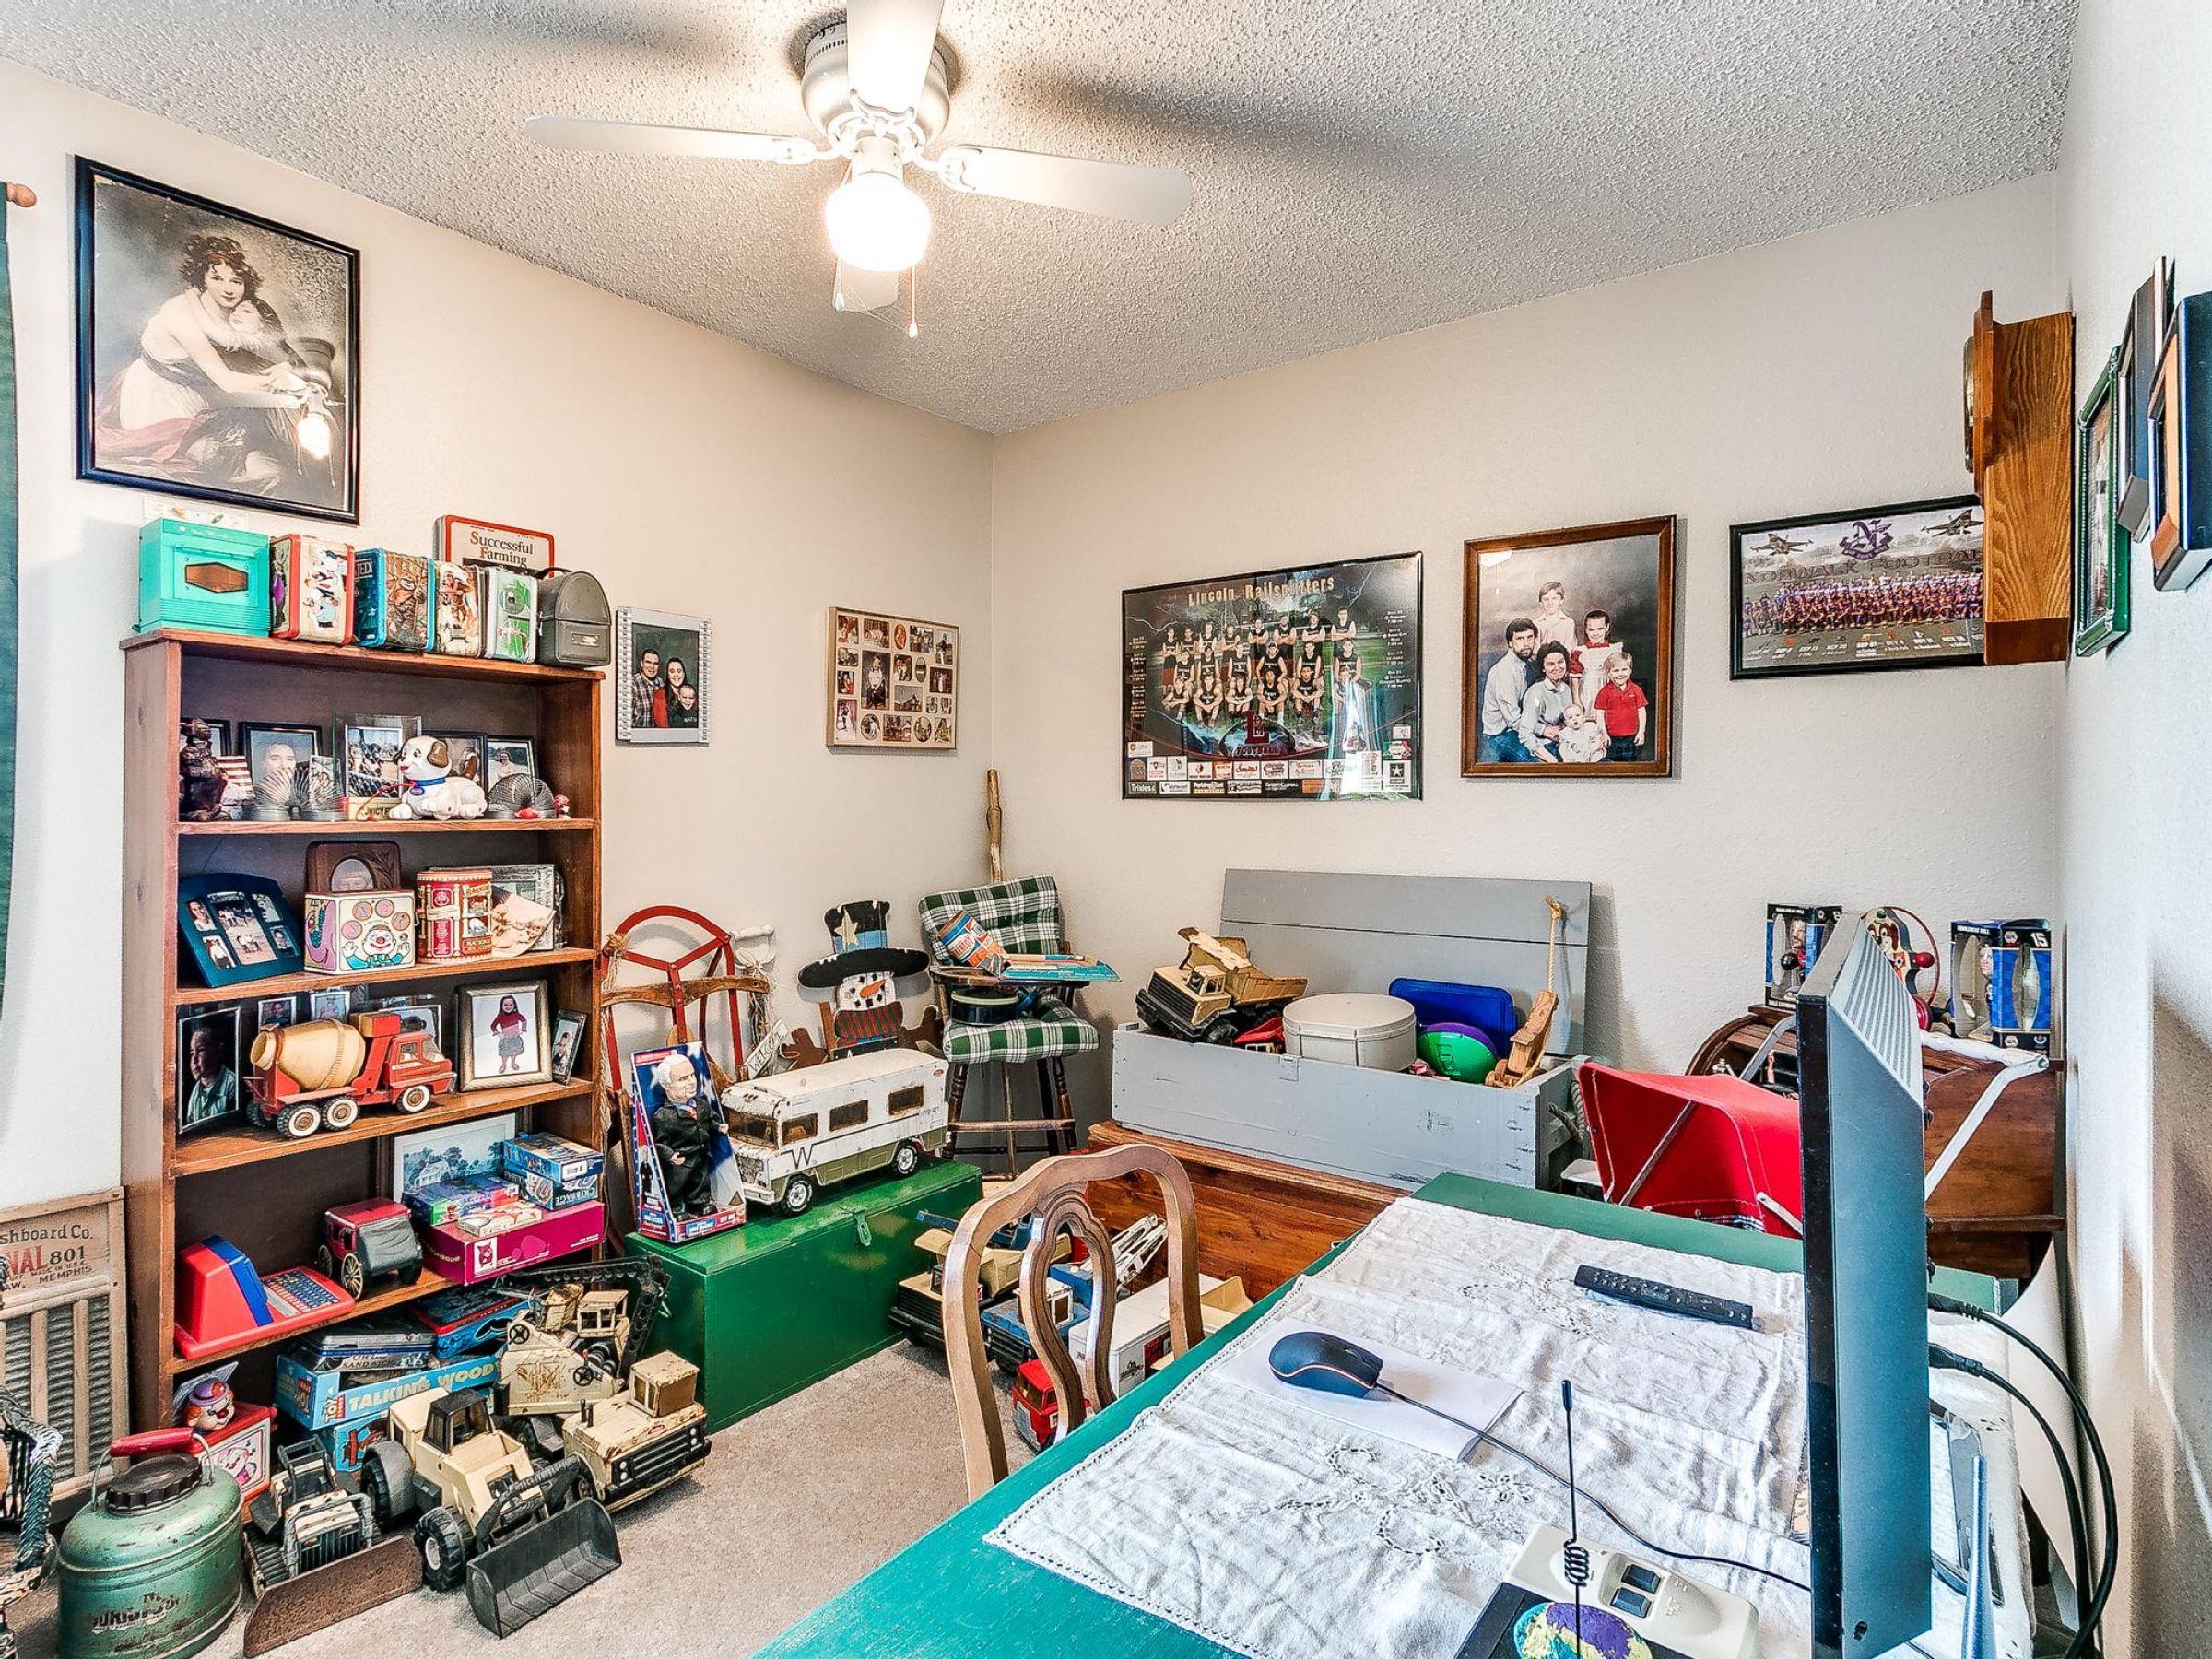 residential-warren-county-iowa-3-acres-listing-number-15593-0-2021-06-18-155610.jpg